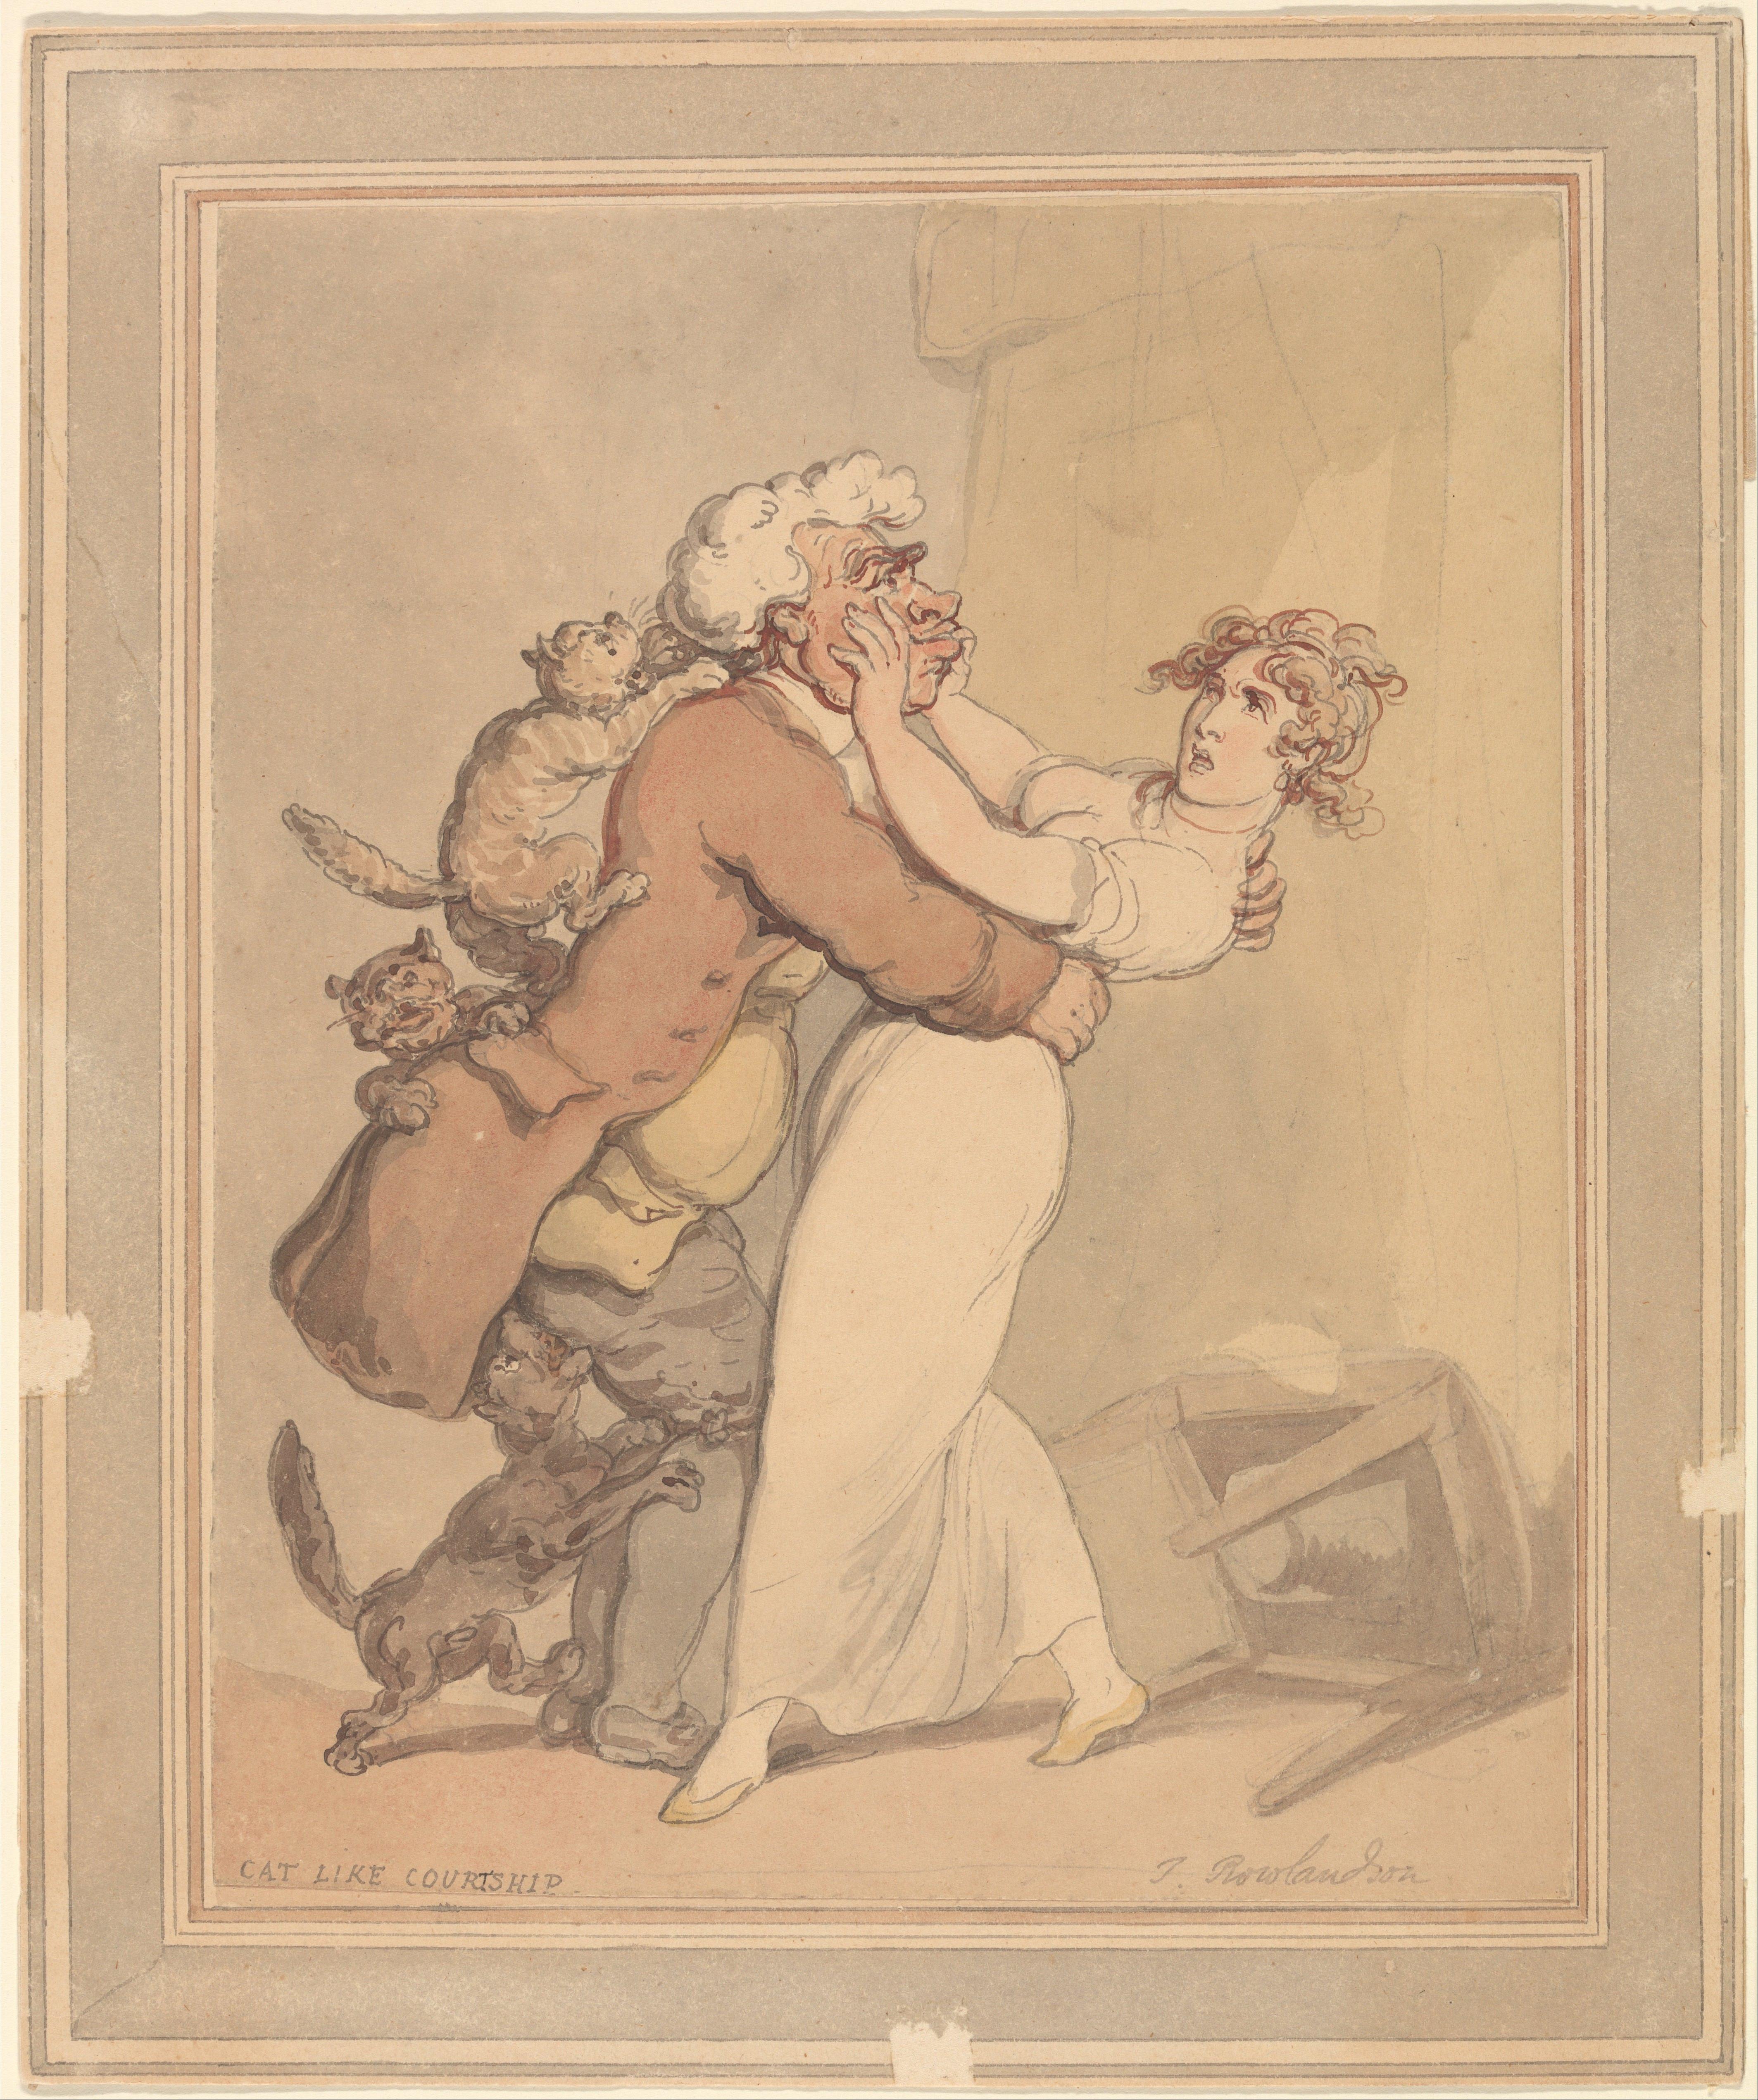 Courtship  Wikipedia